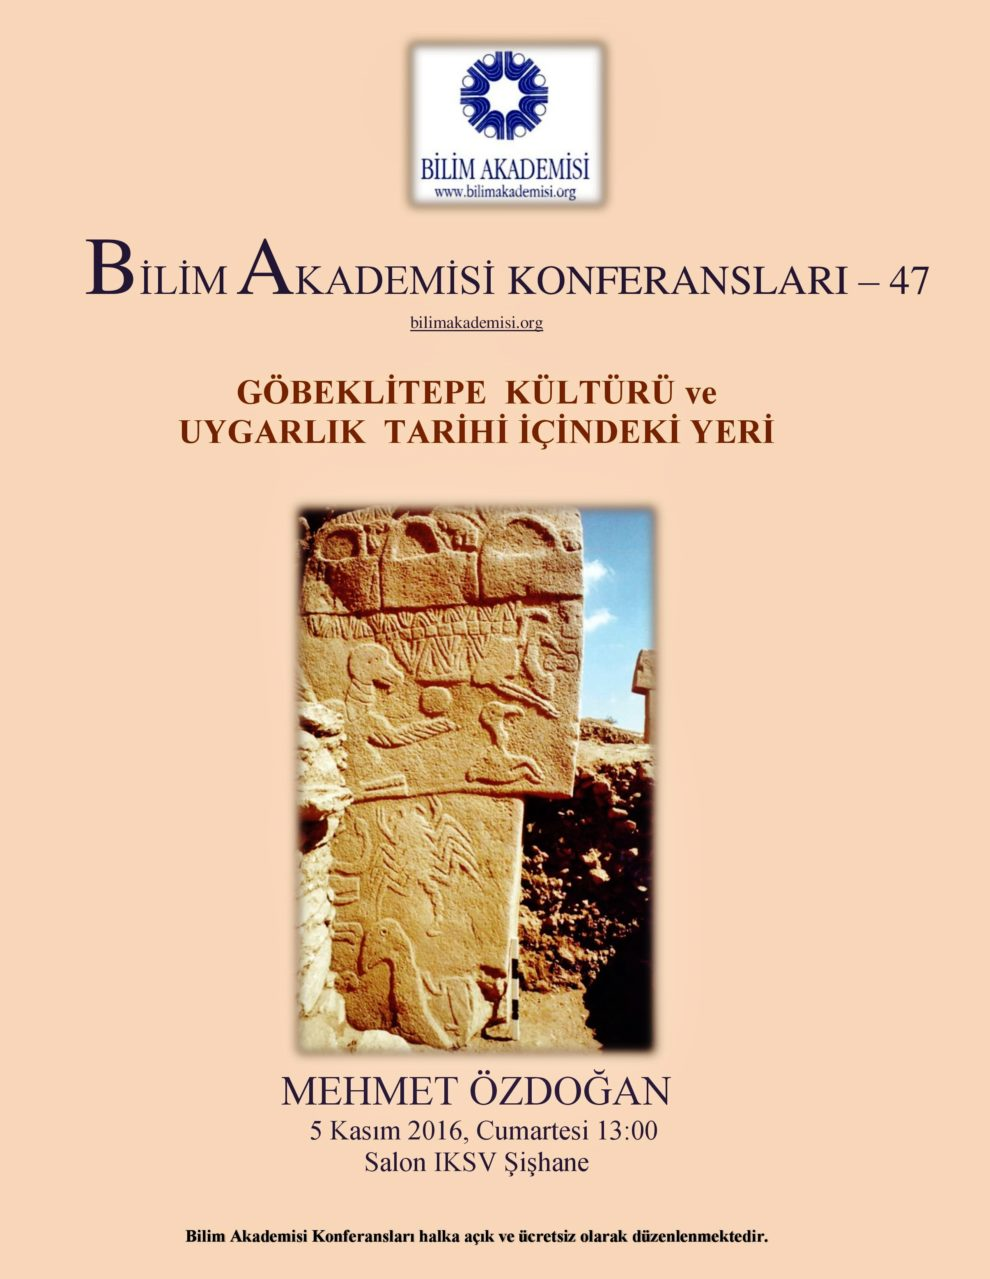 mehmet-ozdogan-5-kasim-2016-ba-konferans-afis-page-001